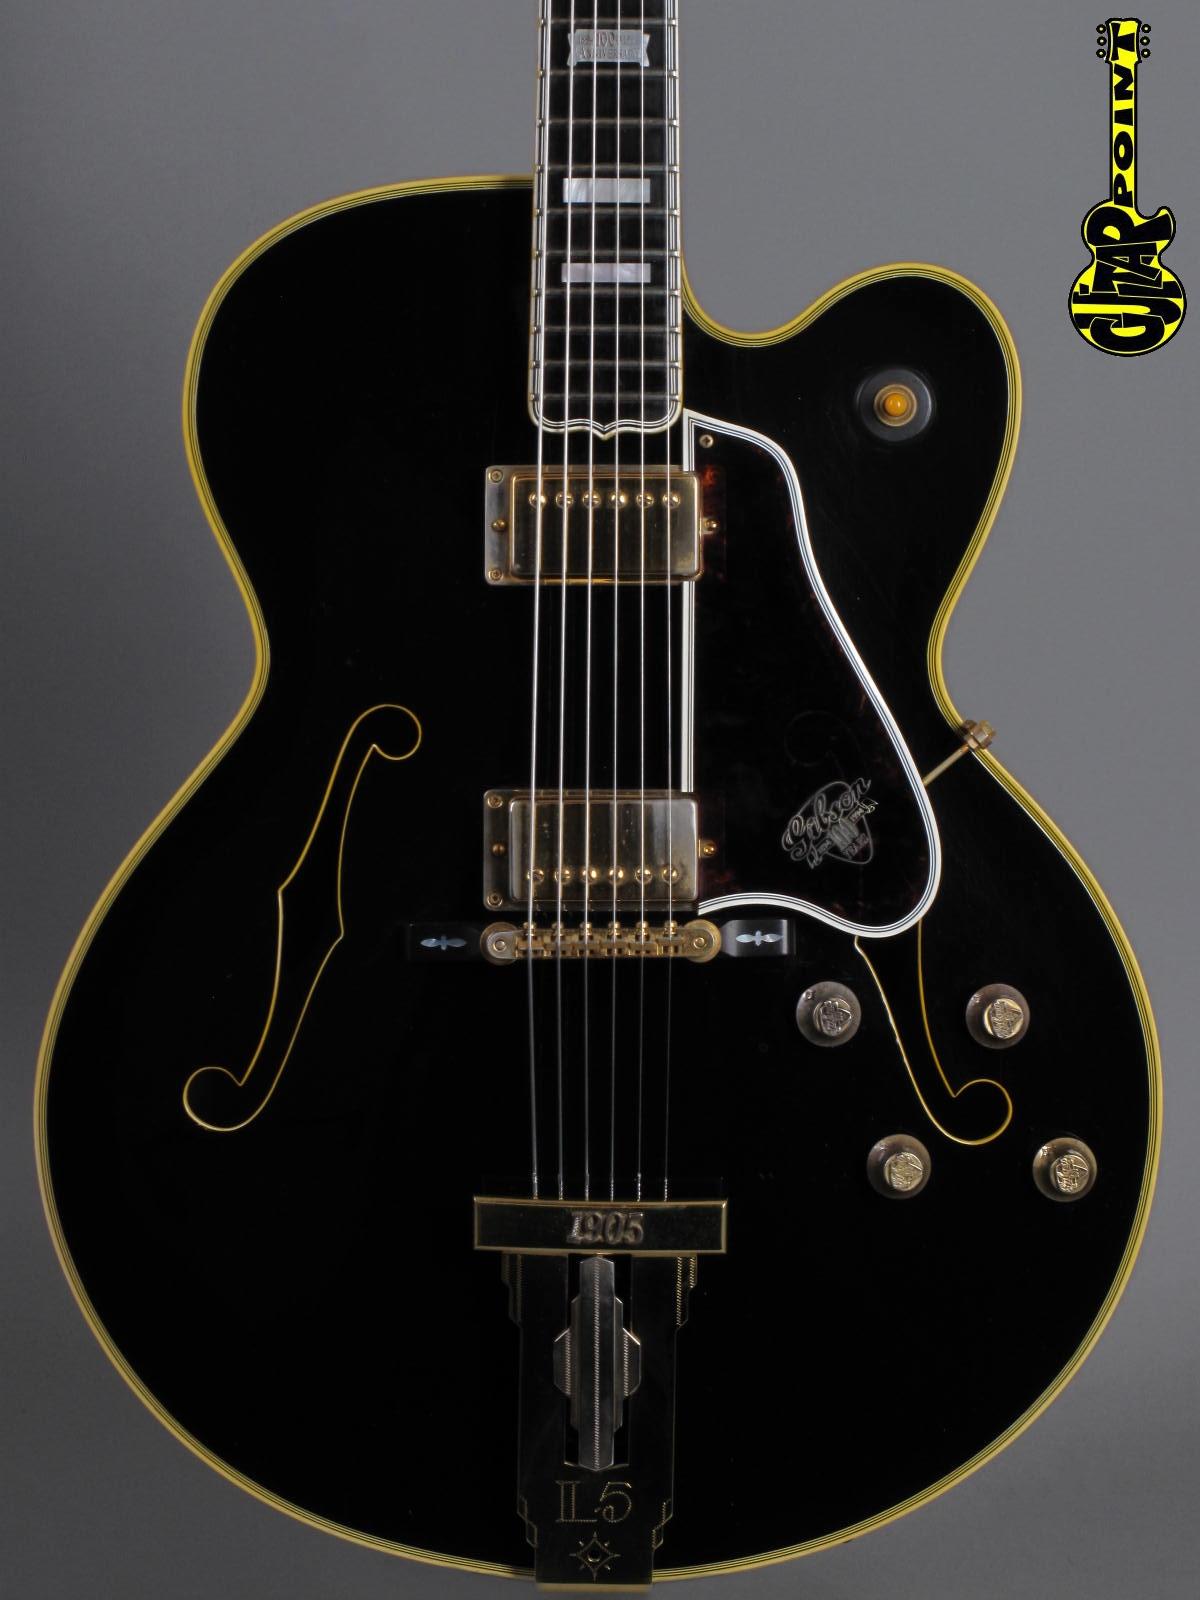 1995 Gibson L-5 Centennial 100th Anniversary - Ebony